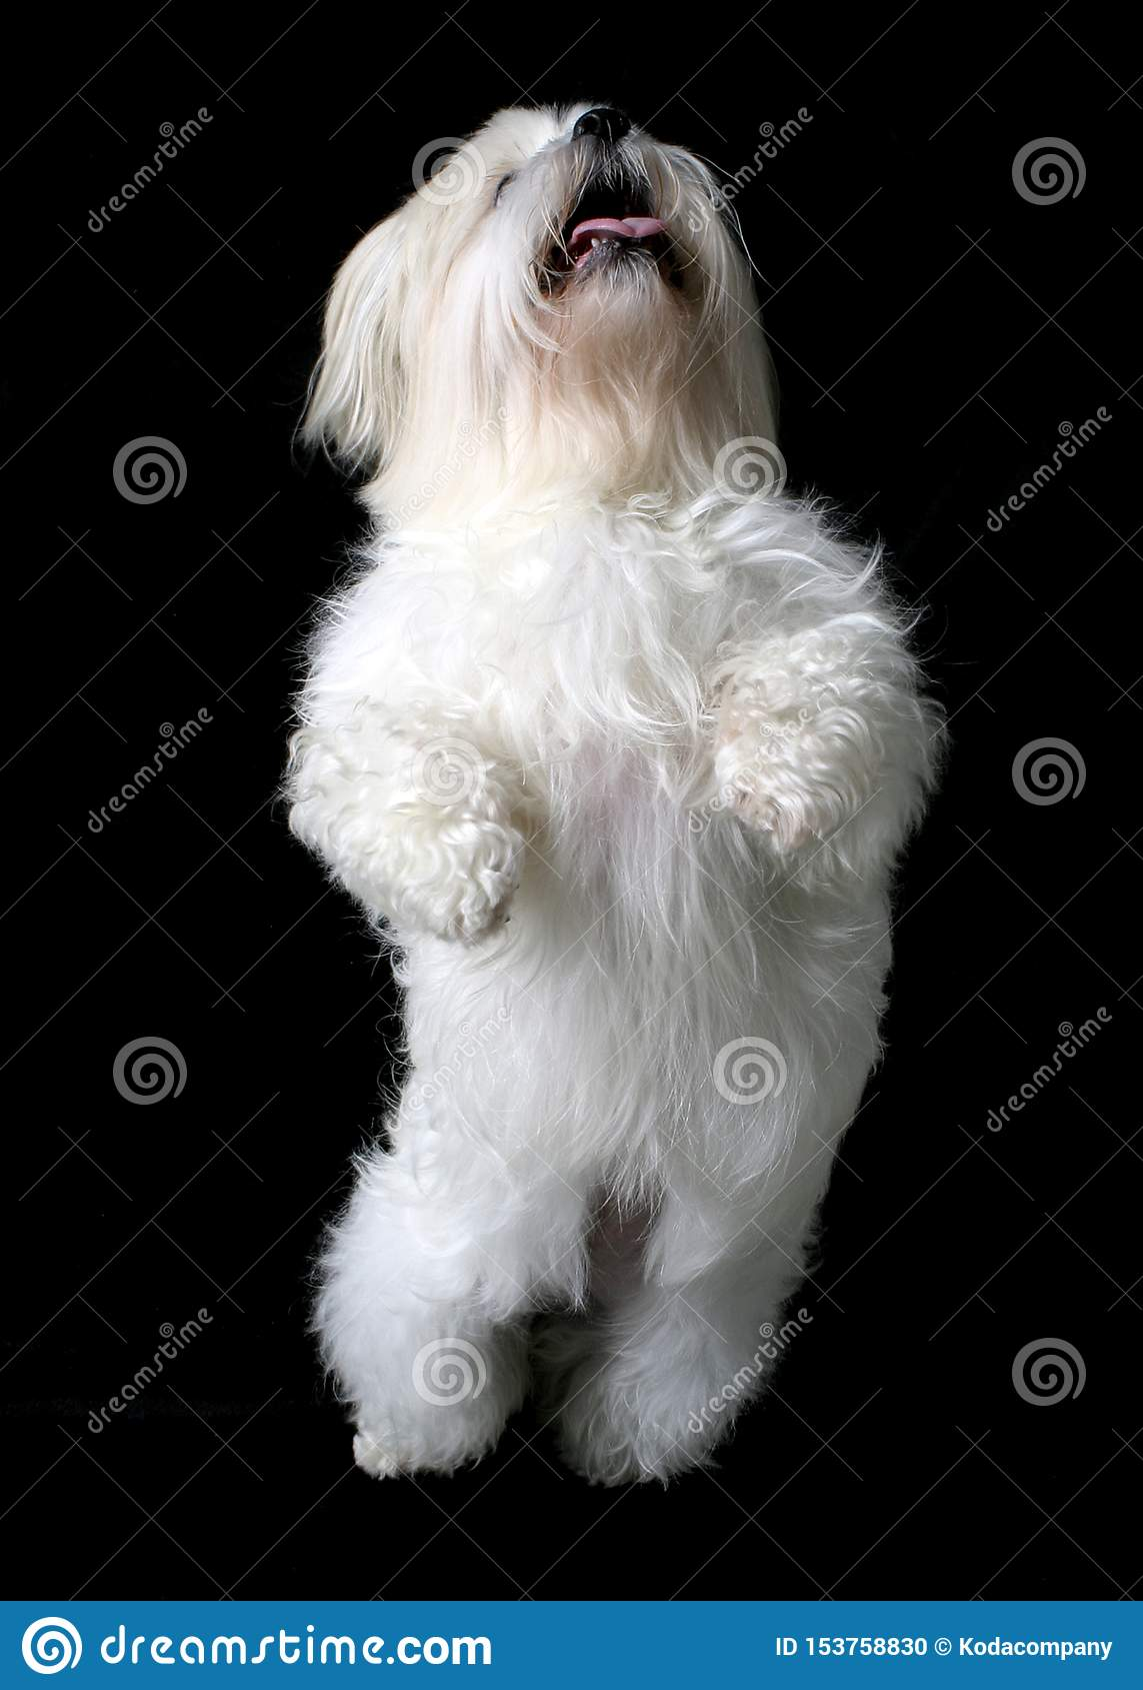 Perro blanco de baile